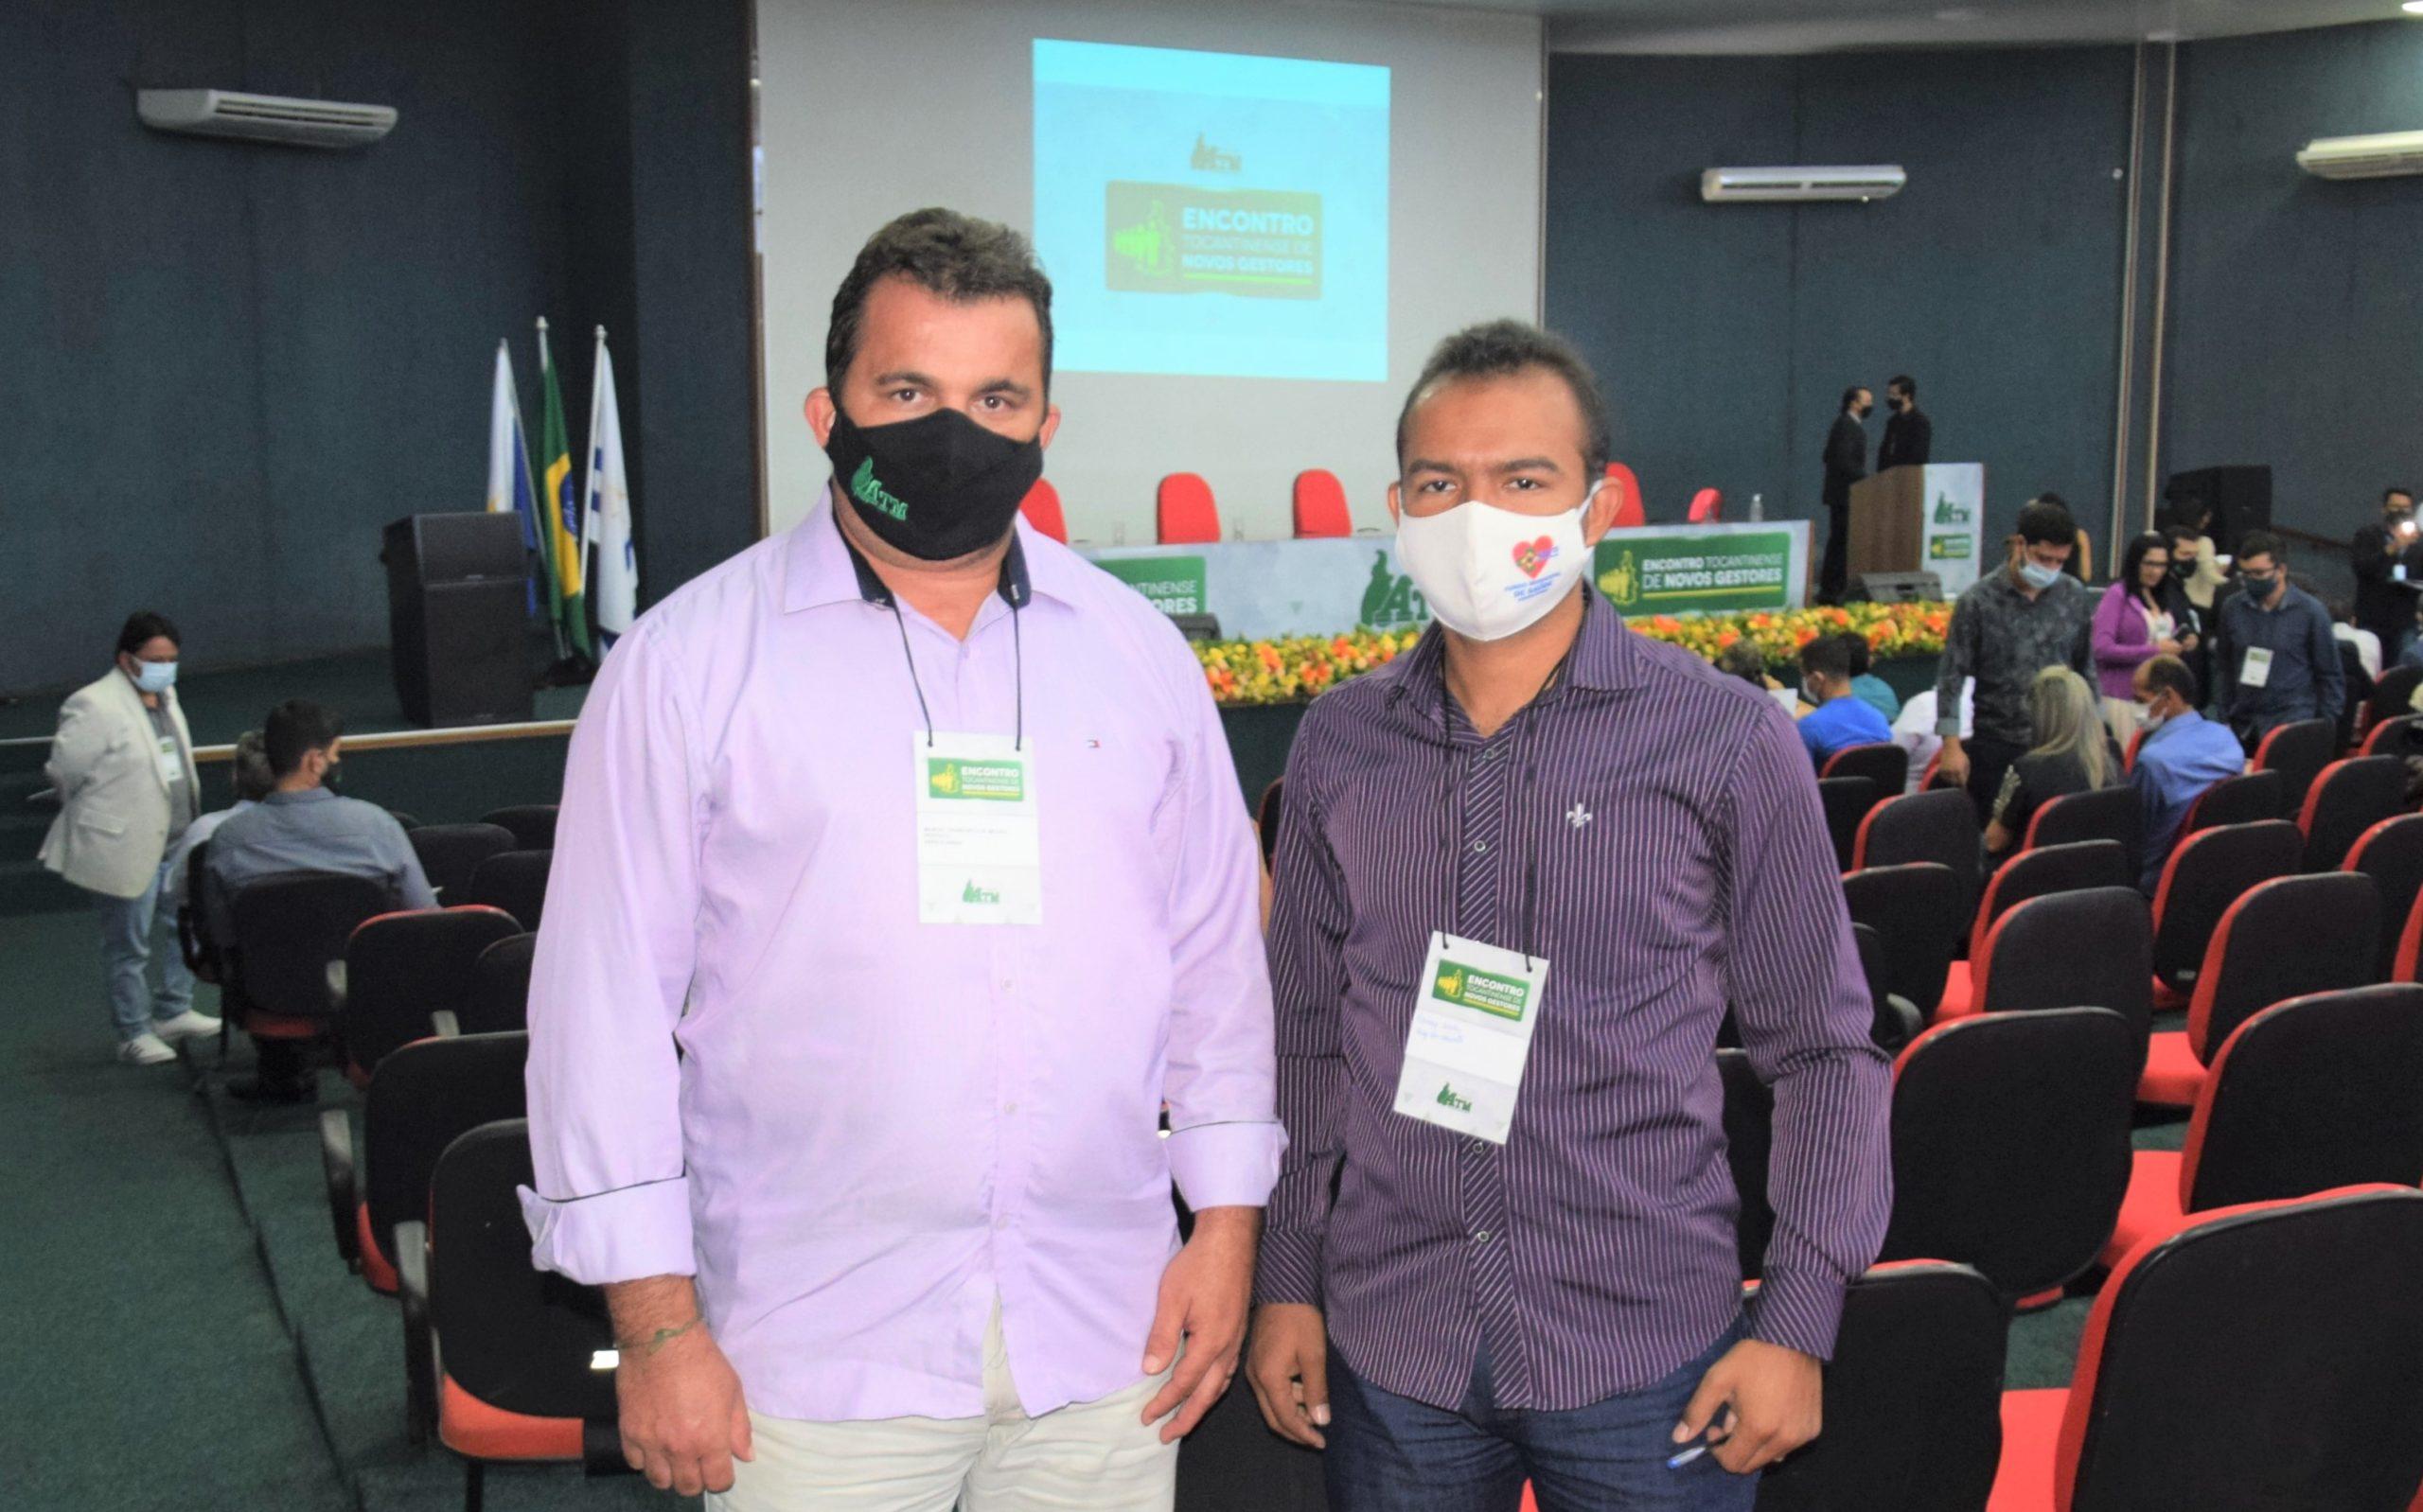 Prefeito de Abreulândia, Manoel Moura participa do Encontro de Novos Gestores da ATM